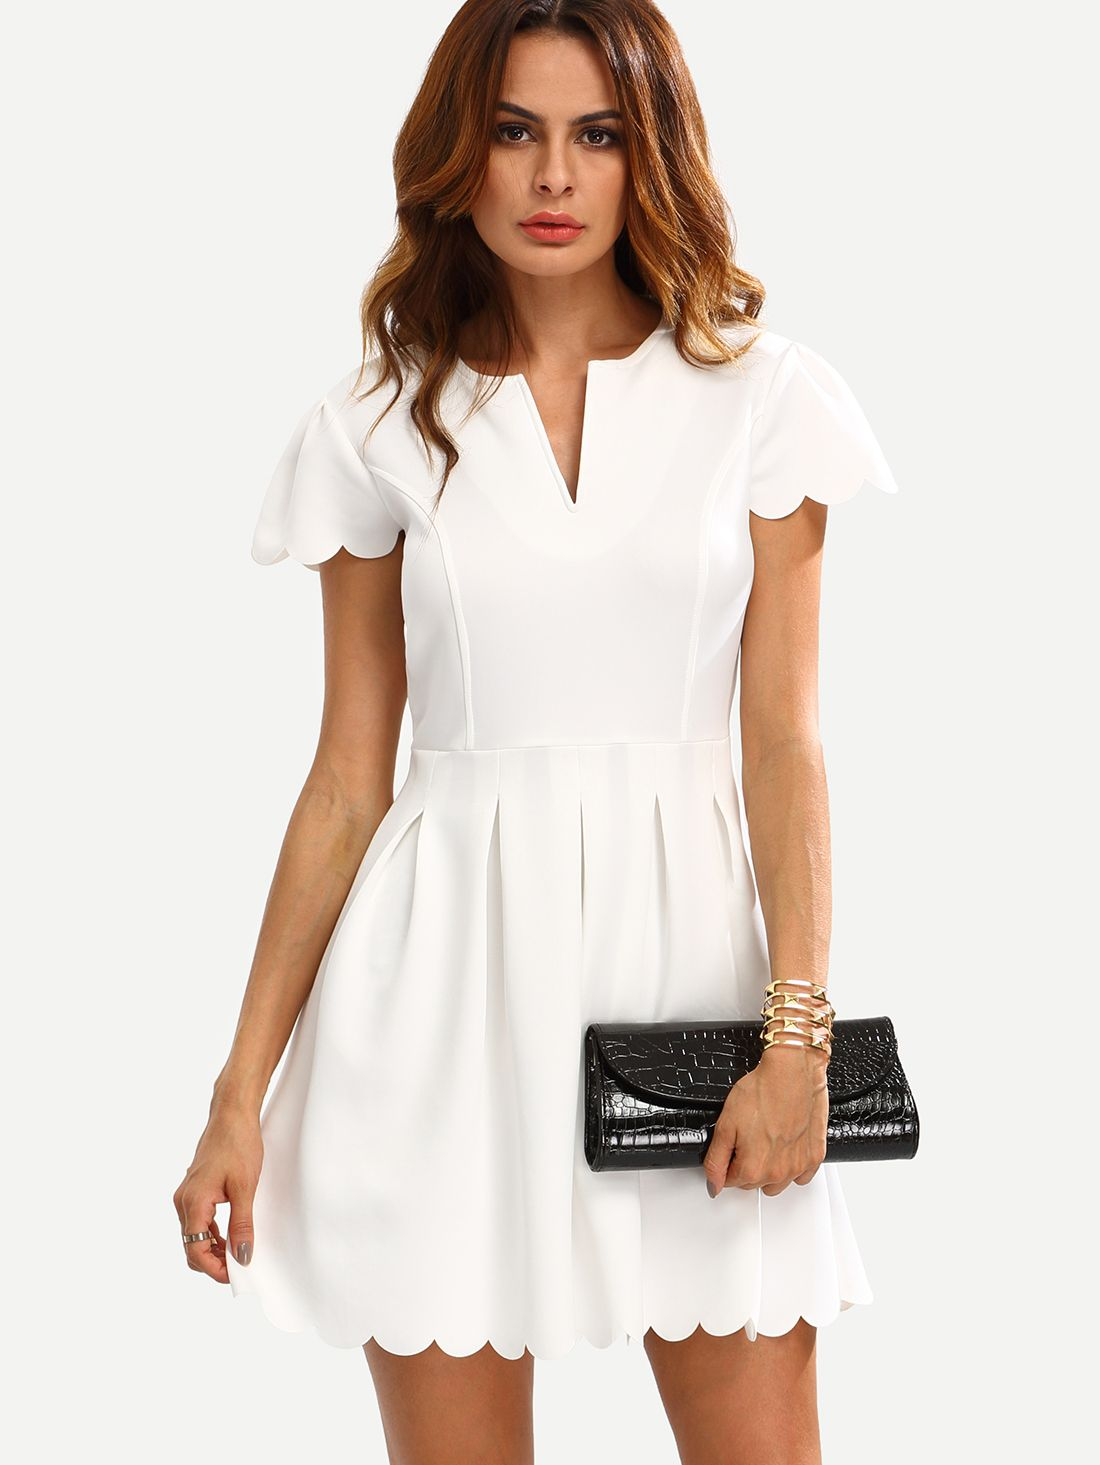 Vestido Corte V Festoneado Lnea A Blanco Faldas Pinterest Nesha Linen Pants In Olive Sheinside